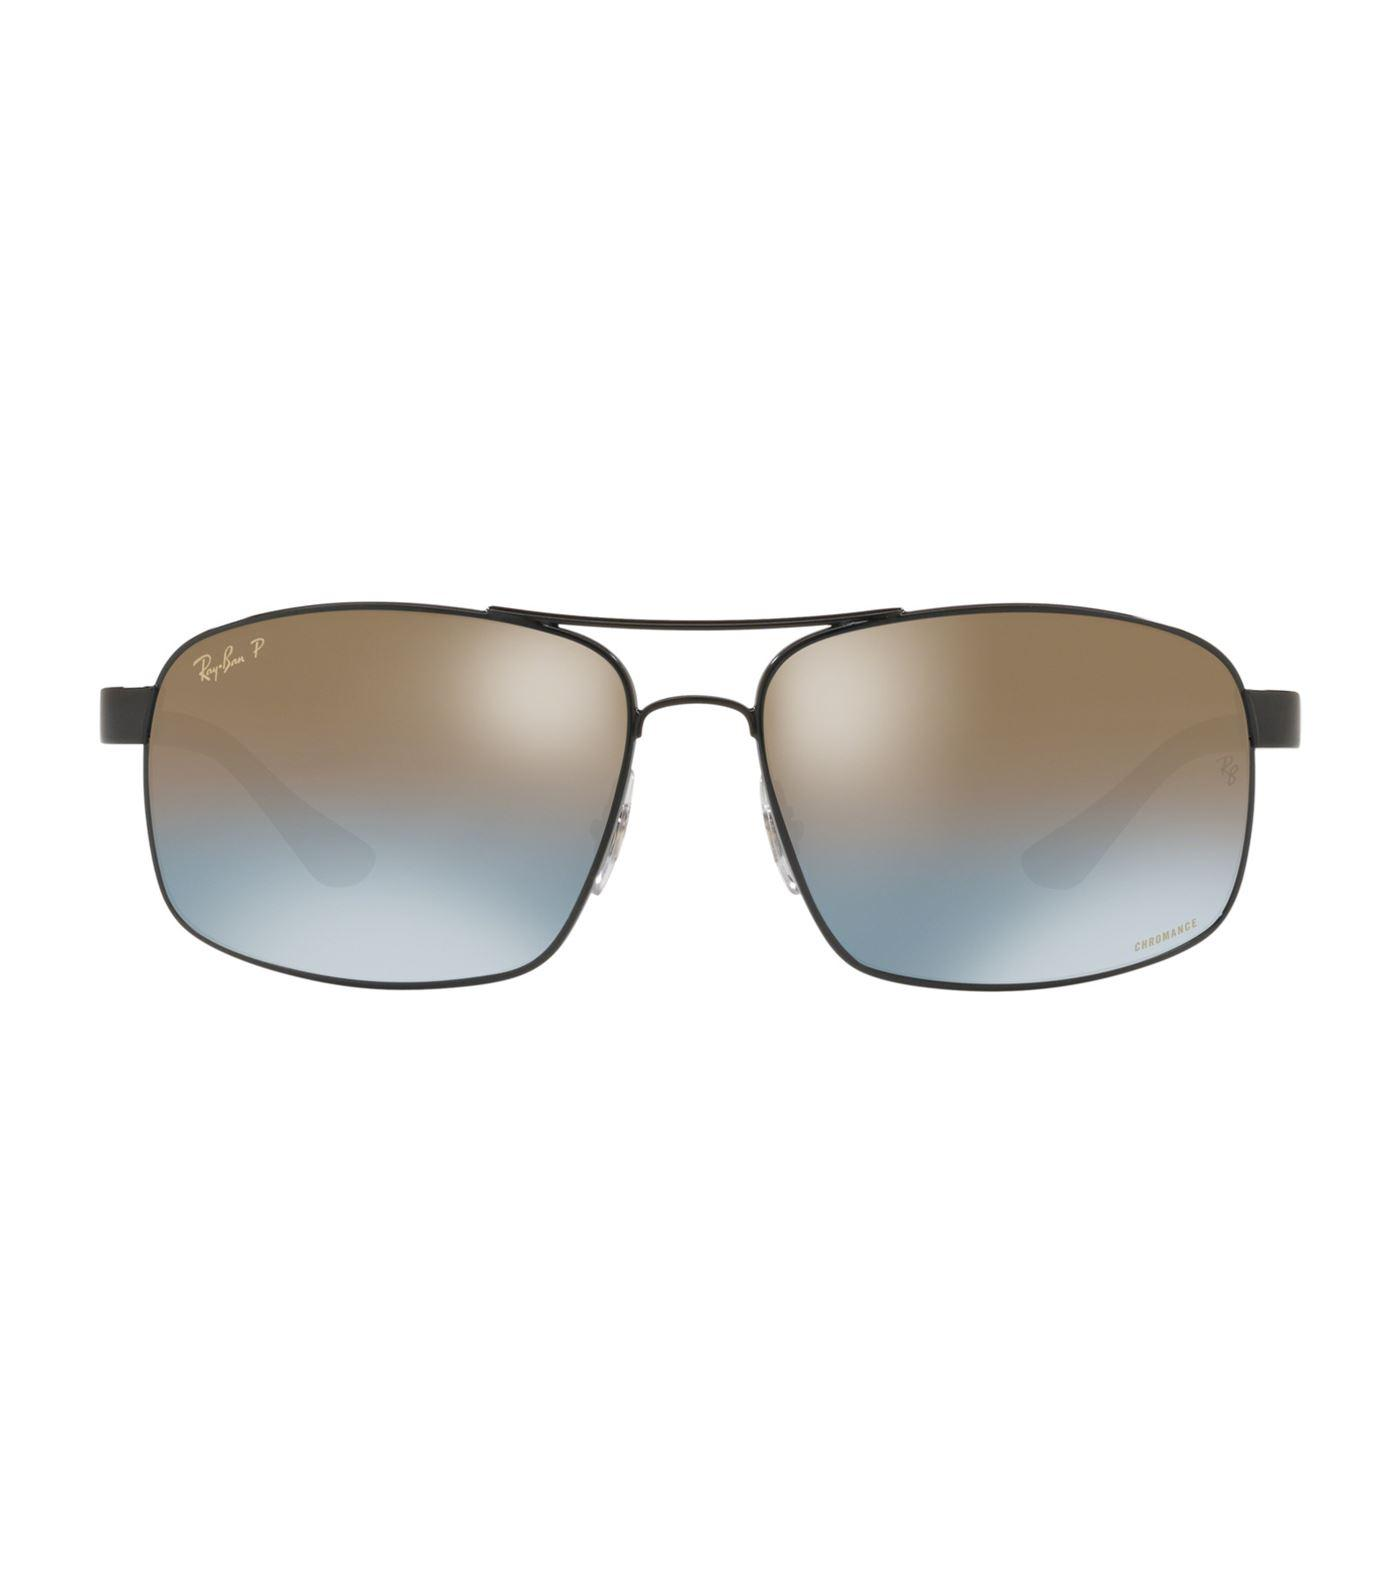 094c9b0f32c Ray-Ban Rectangular Chromance Sunglasses in Black for Men - Lyst